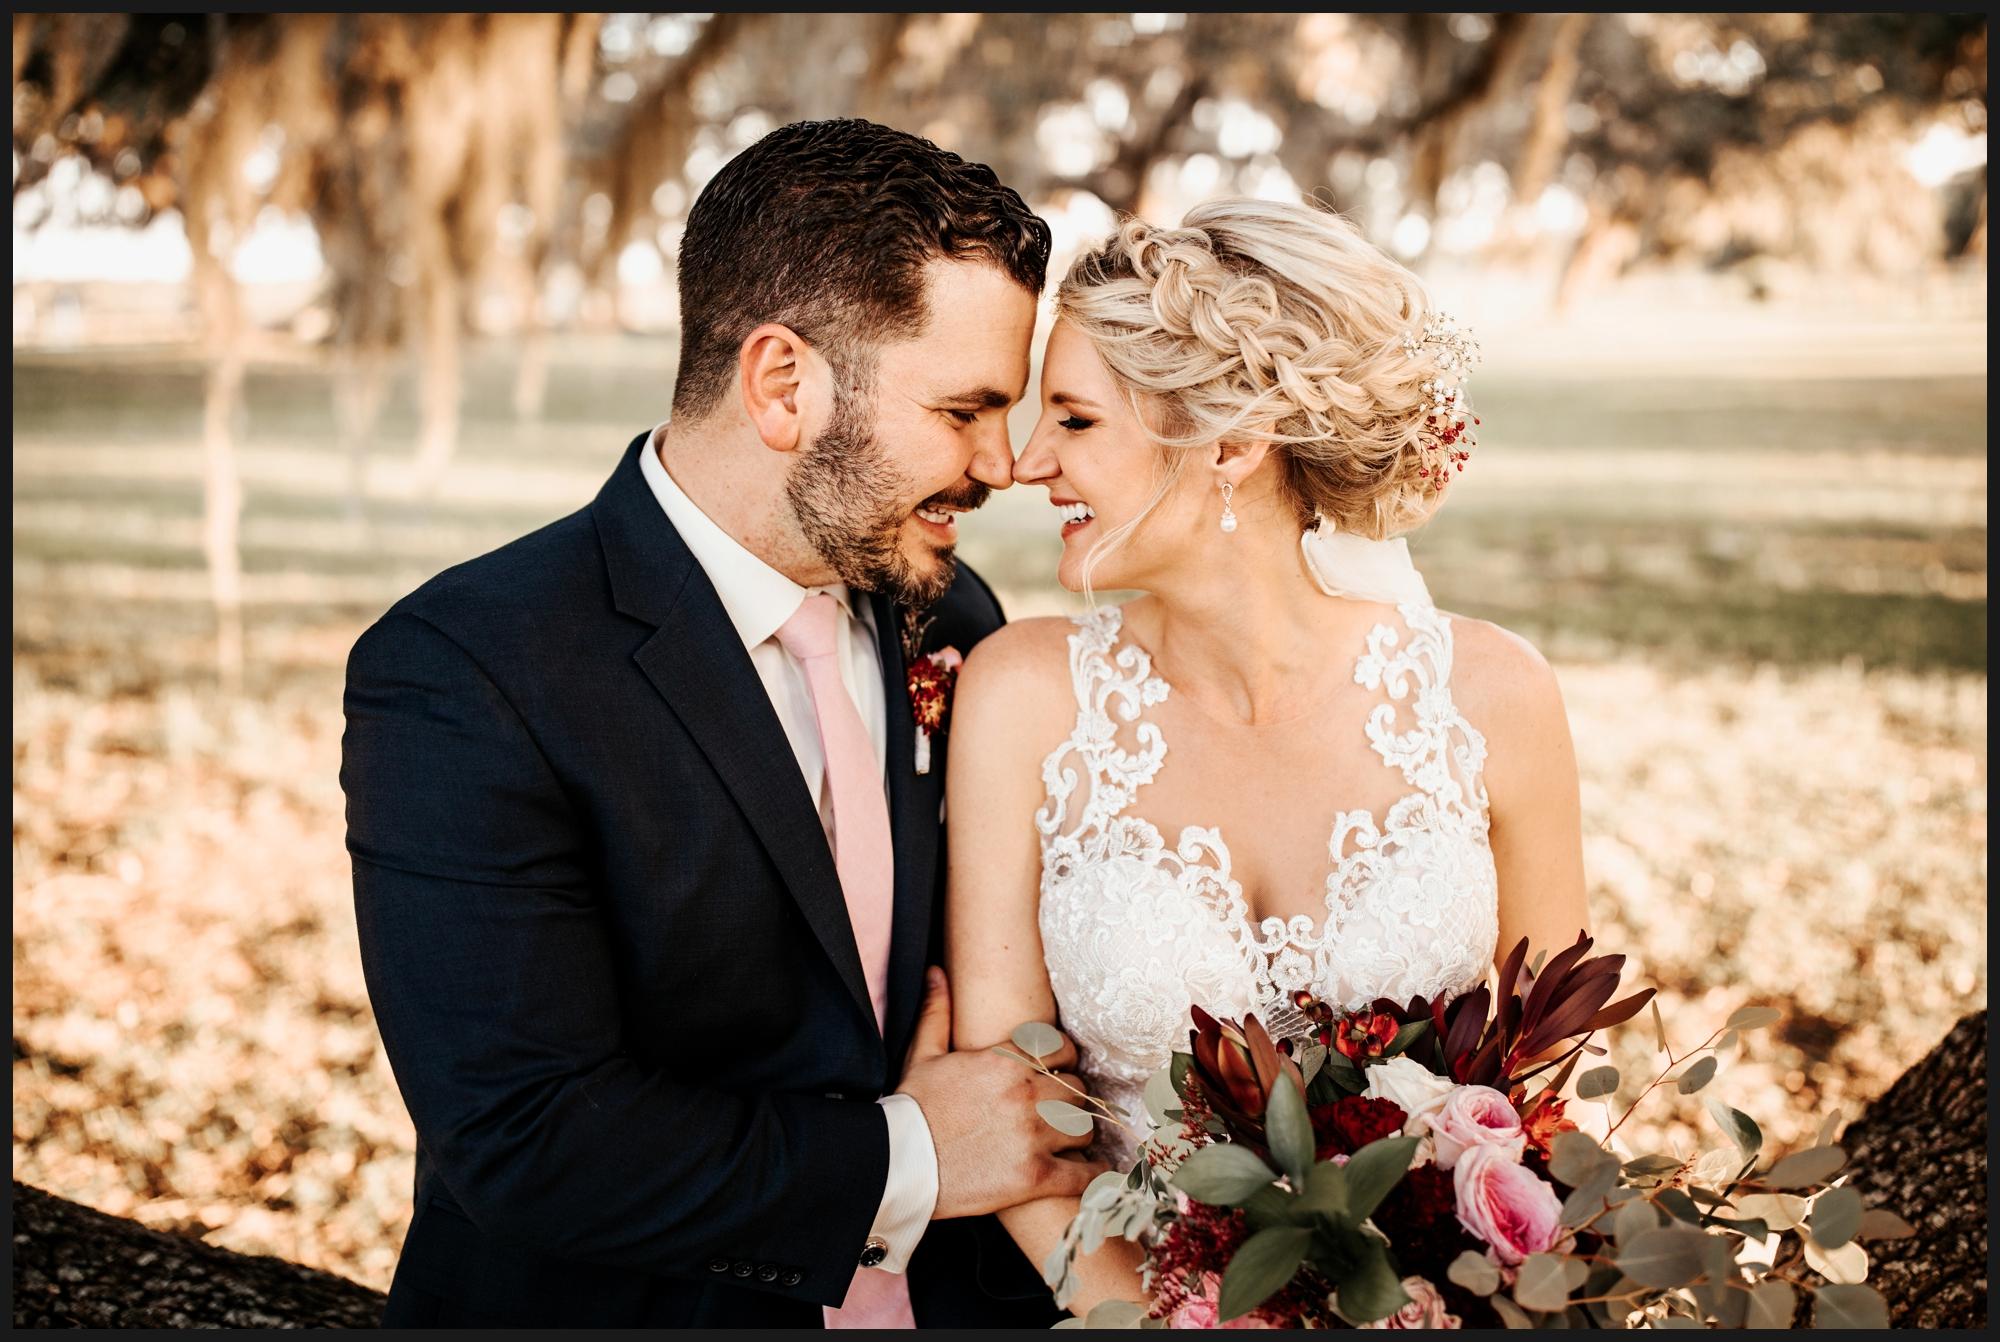 Orlando-Wedding-Photographer-destination-wedding-photographer-florida-wedding-photographer-hawaii-wedding-photographer_0611.jpg